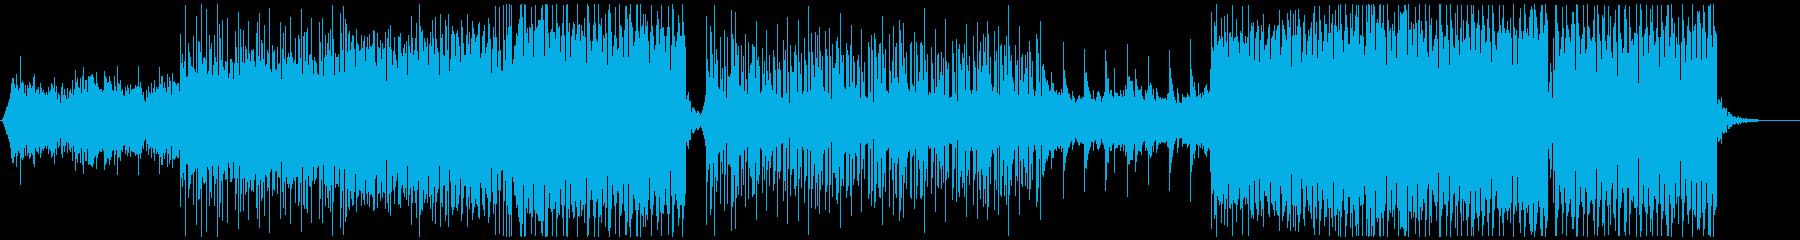 K-pop、洋楽系!EDMトラックの再生済みの波形